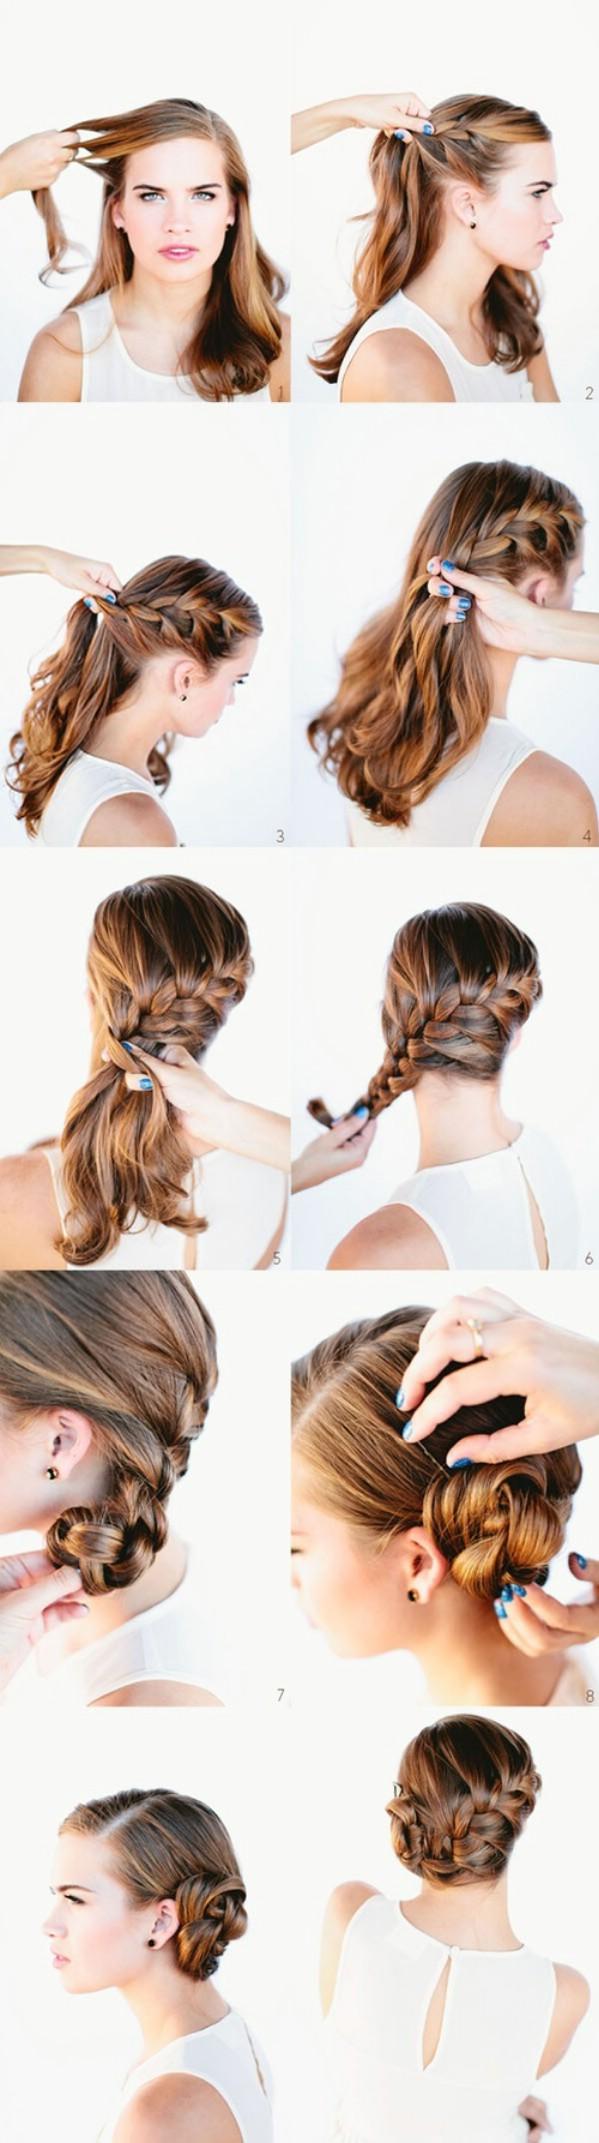 Awe Inspiring Stunning Diy Hairstyle Side French Braid Into A Bun Women39S Short Hairstyles For Black Women Fulllsitofus